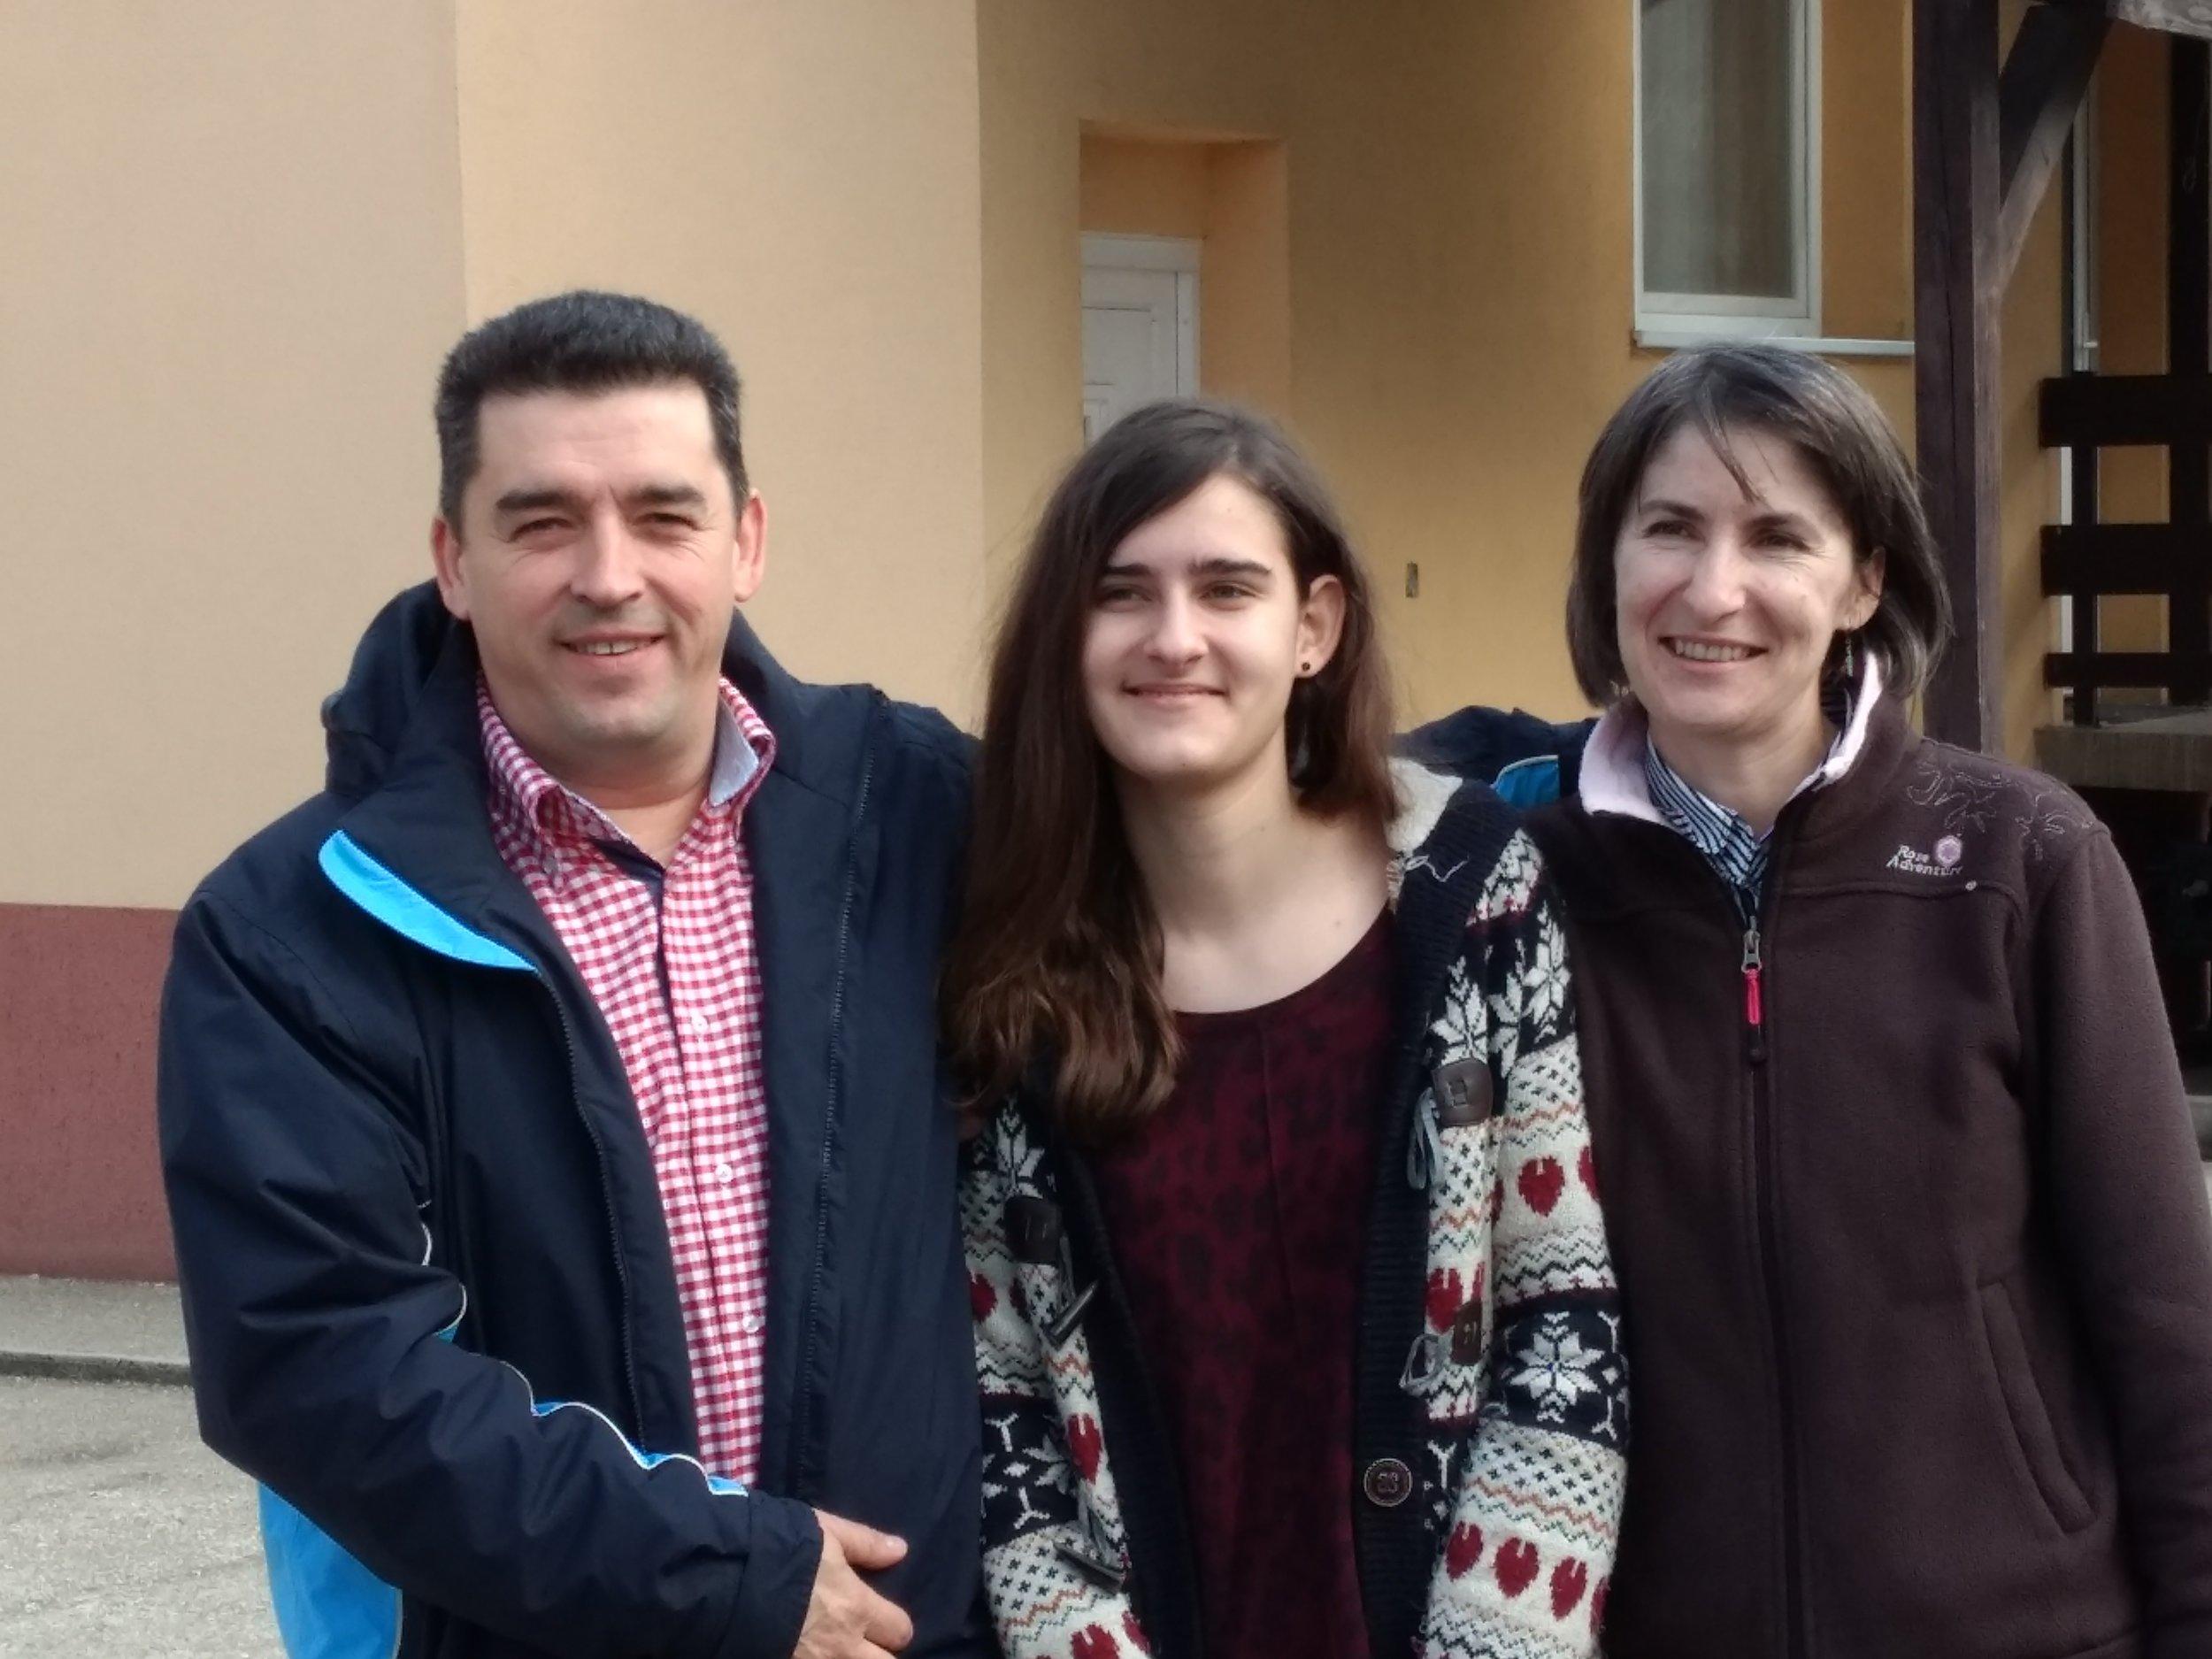 Pastor Imre Szoke, wife Khristina and daughter